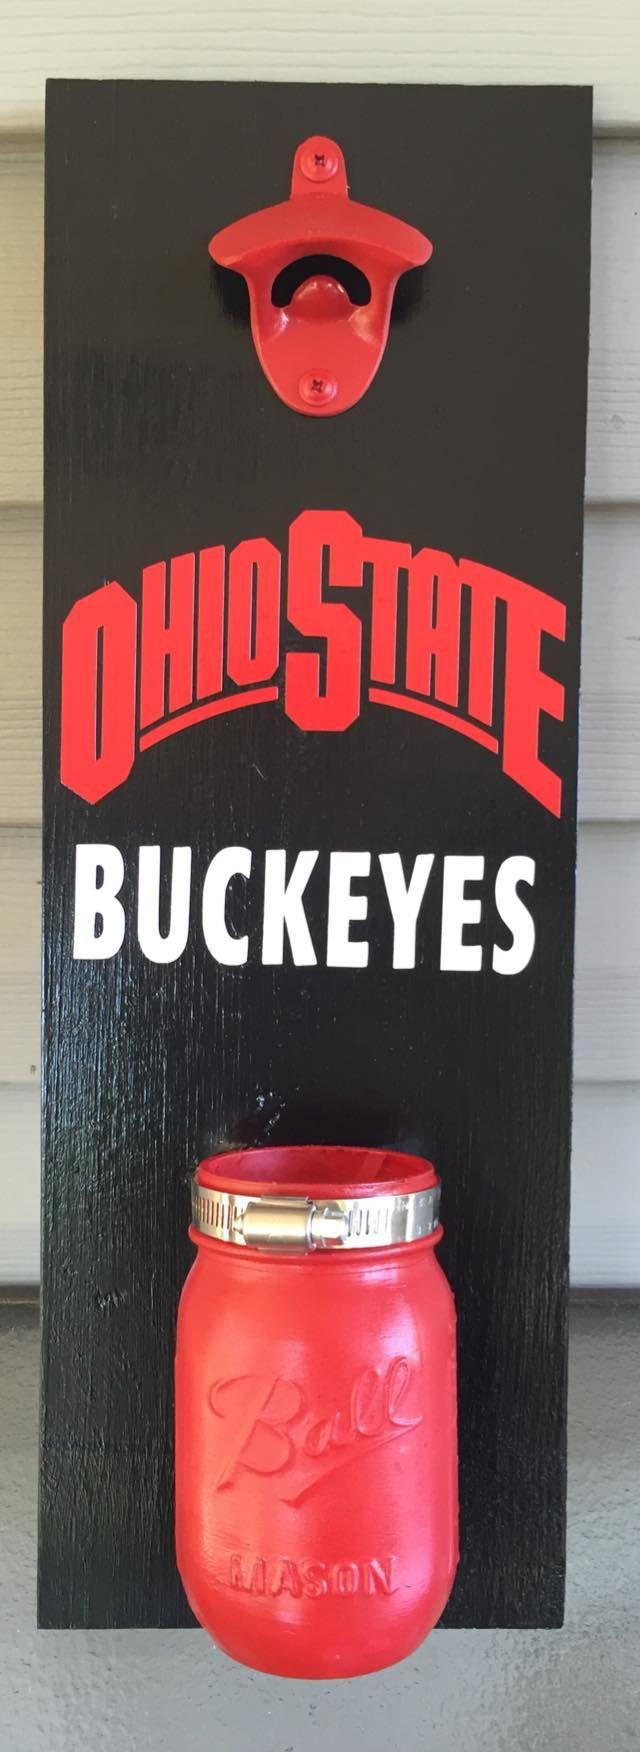 Ohio State Buckeyes wall mounted bottle opener. Has mason jar cap catcher. #gobucks #ohiostate #wallmountbottleopener #wallbottleopener #bottleopener #beer #beerme #bottles #buckeyes #masonjar #masonjars #bar #handmade #toledopalletco